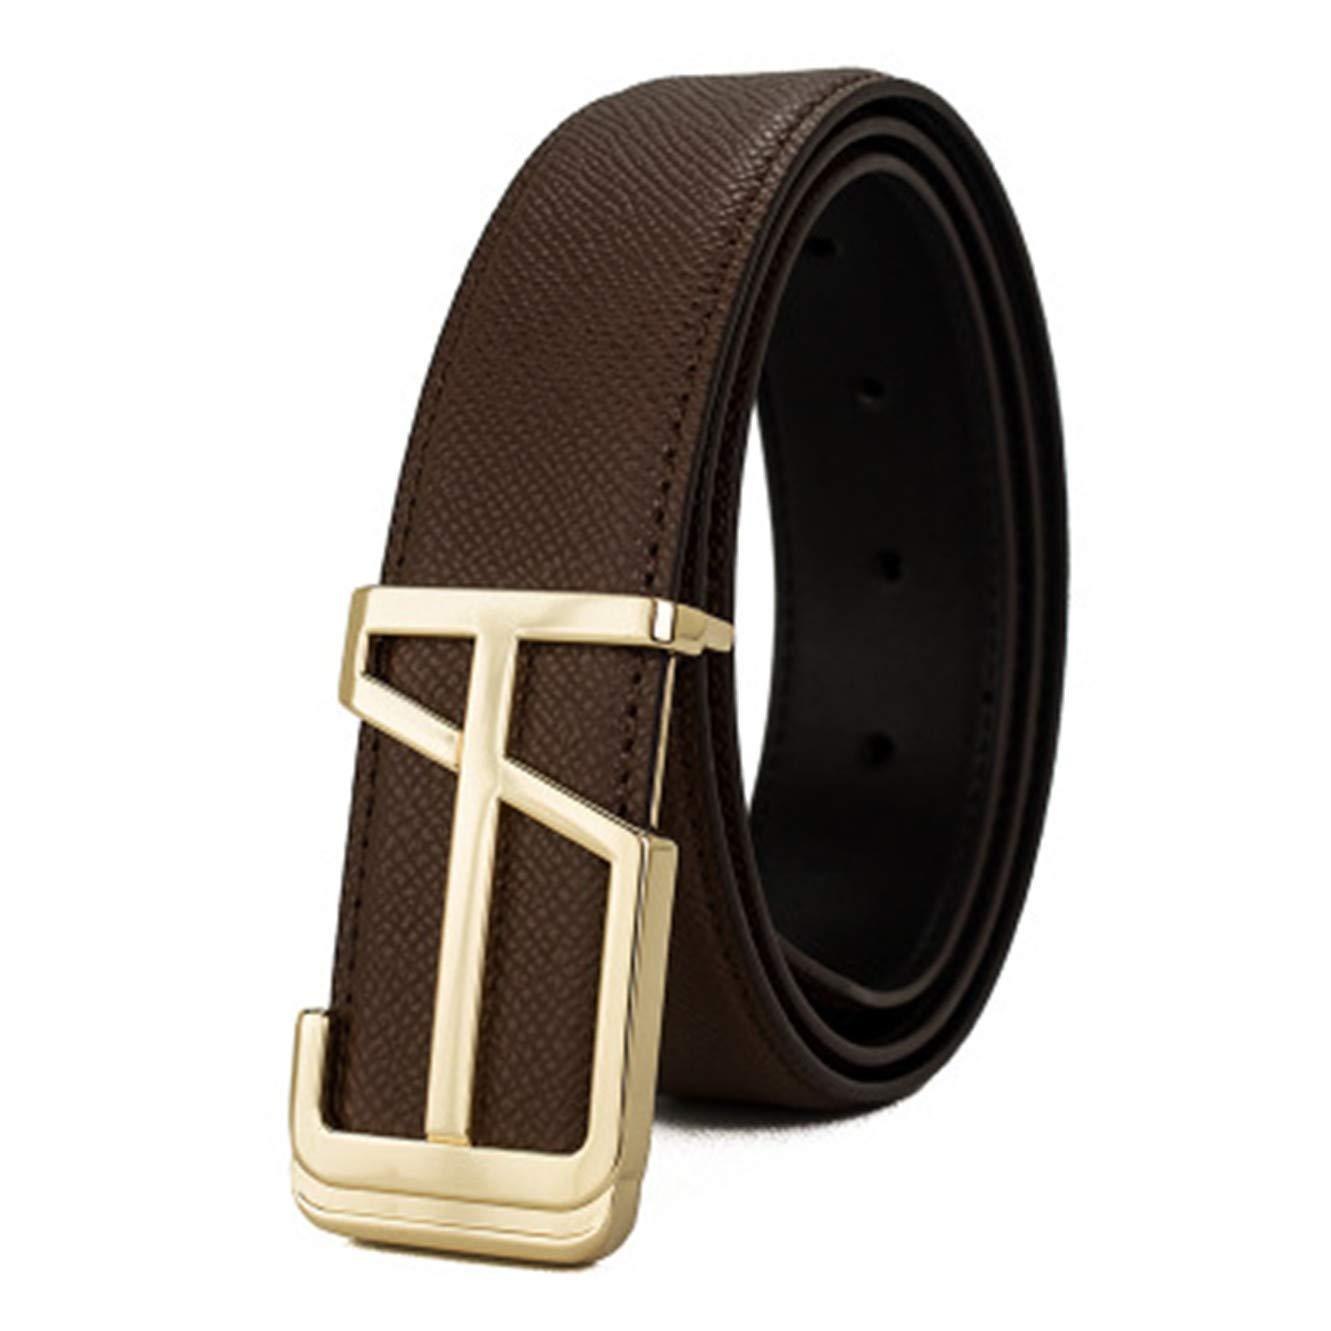 Mens brand high-grade leather belt creative buckle palm pattern belt